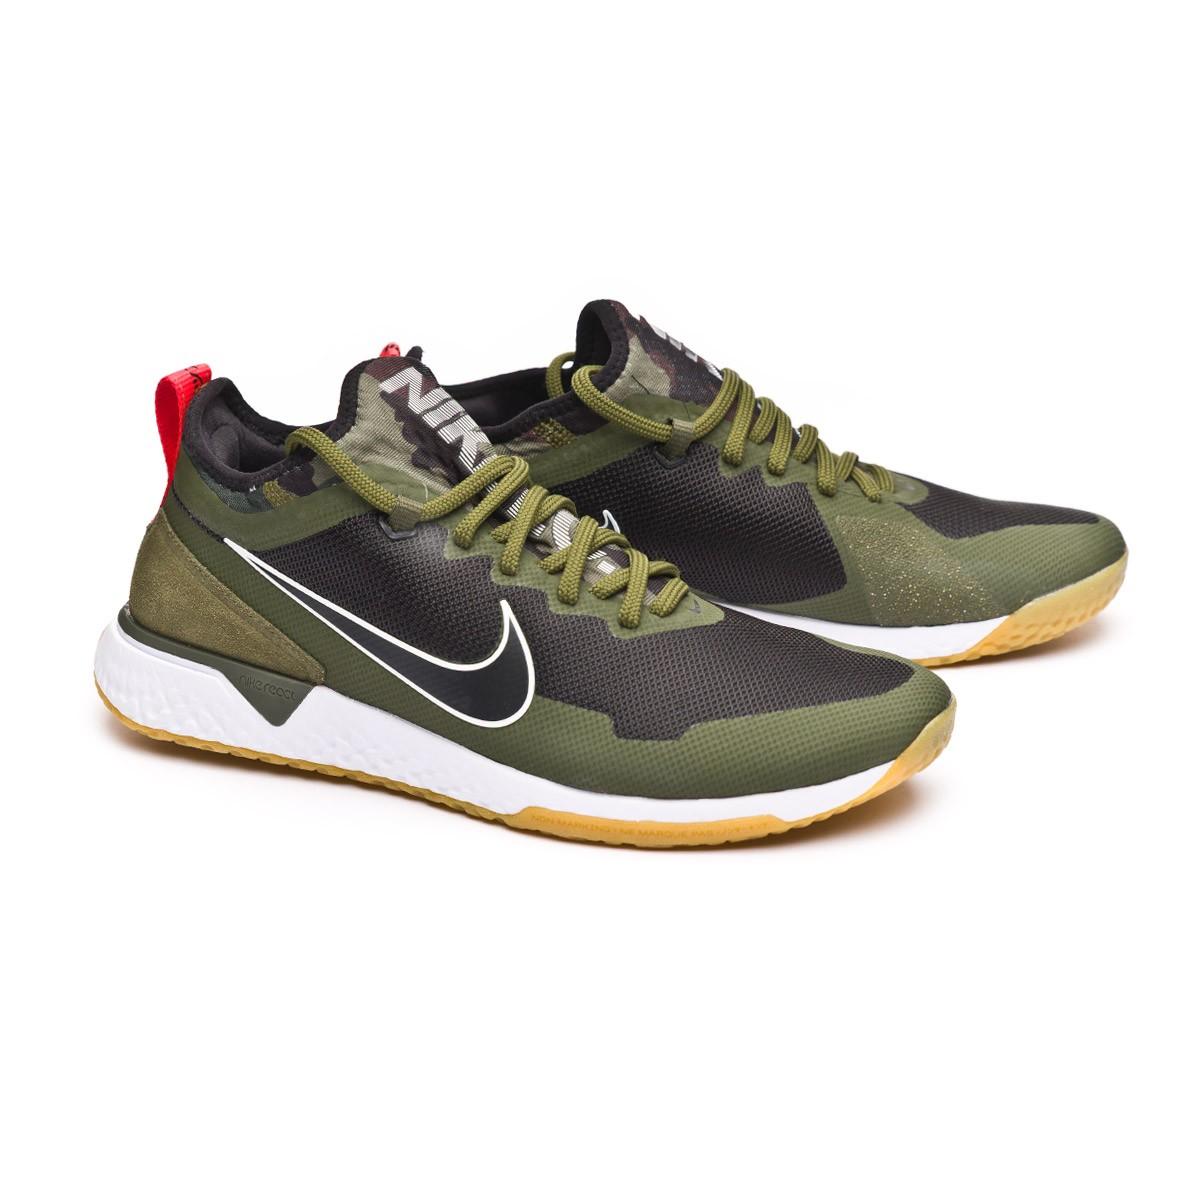 0084b30b7ab5d Trainers Nike Nike F.C. x Neymar Jr Black-Legion green-Cargo khaki ...